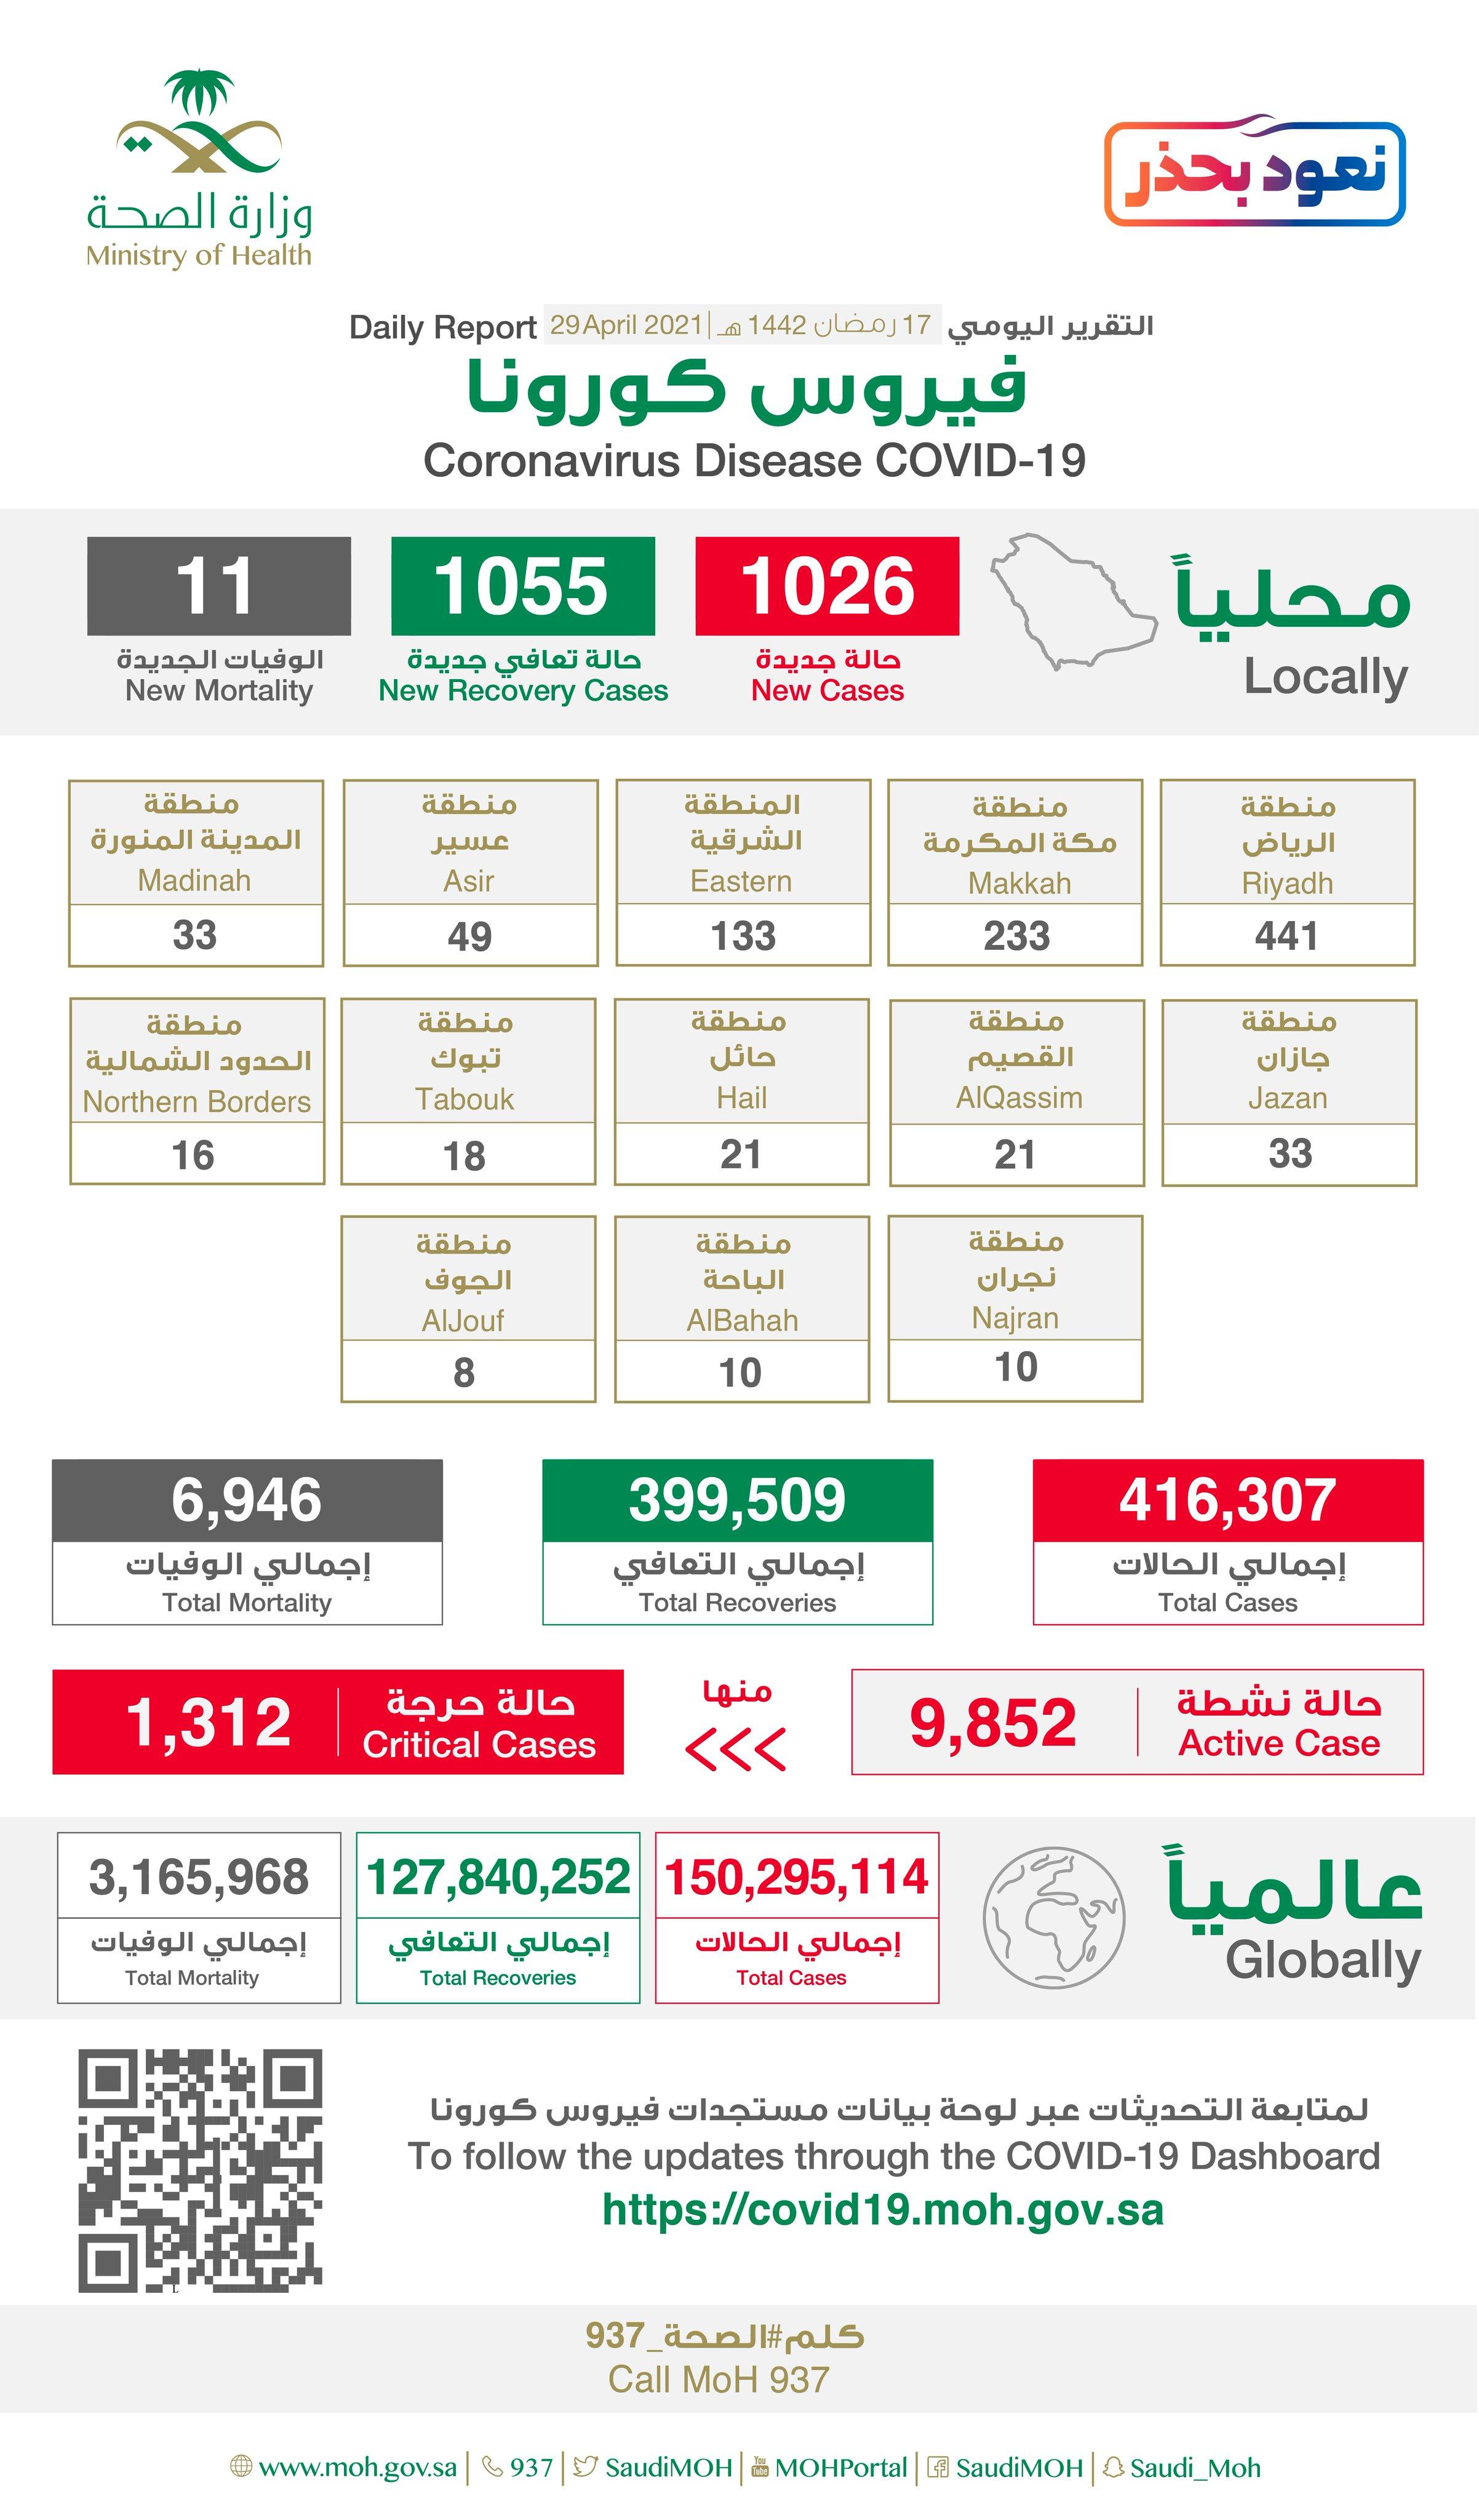 Saudi Arabia Coronavirus : Total Cases :416,307, New Cases : 1,026 , Cured : 399,509 , Deaths: 6,946, Active Cases : 9,852